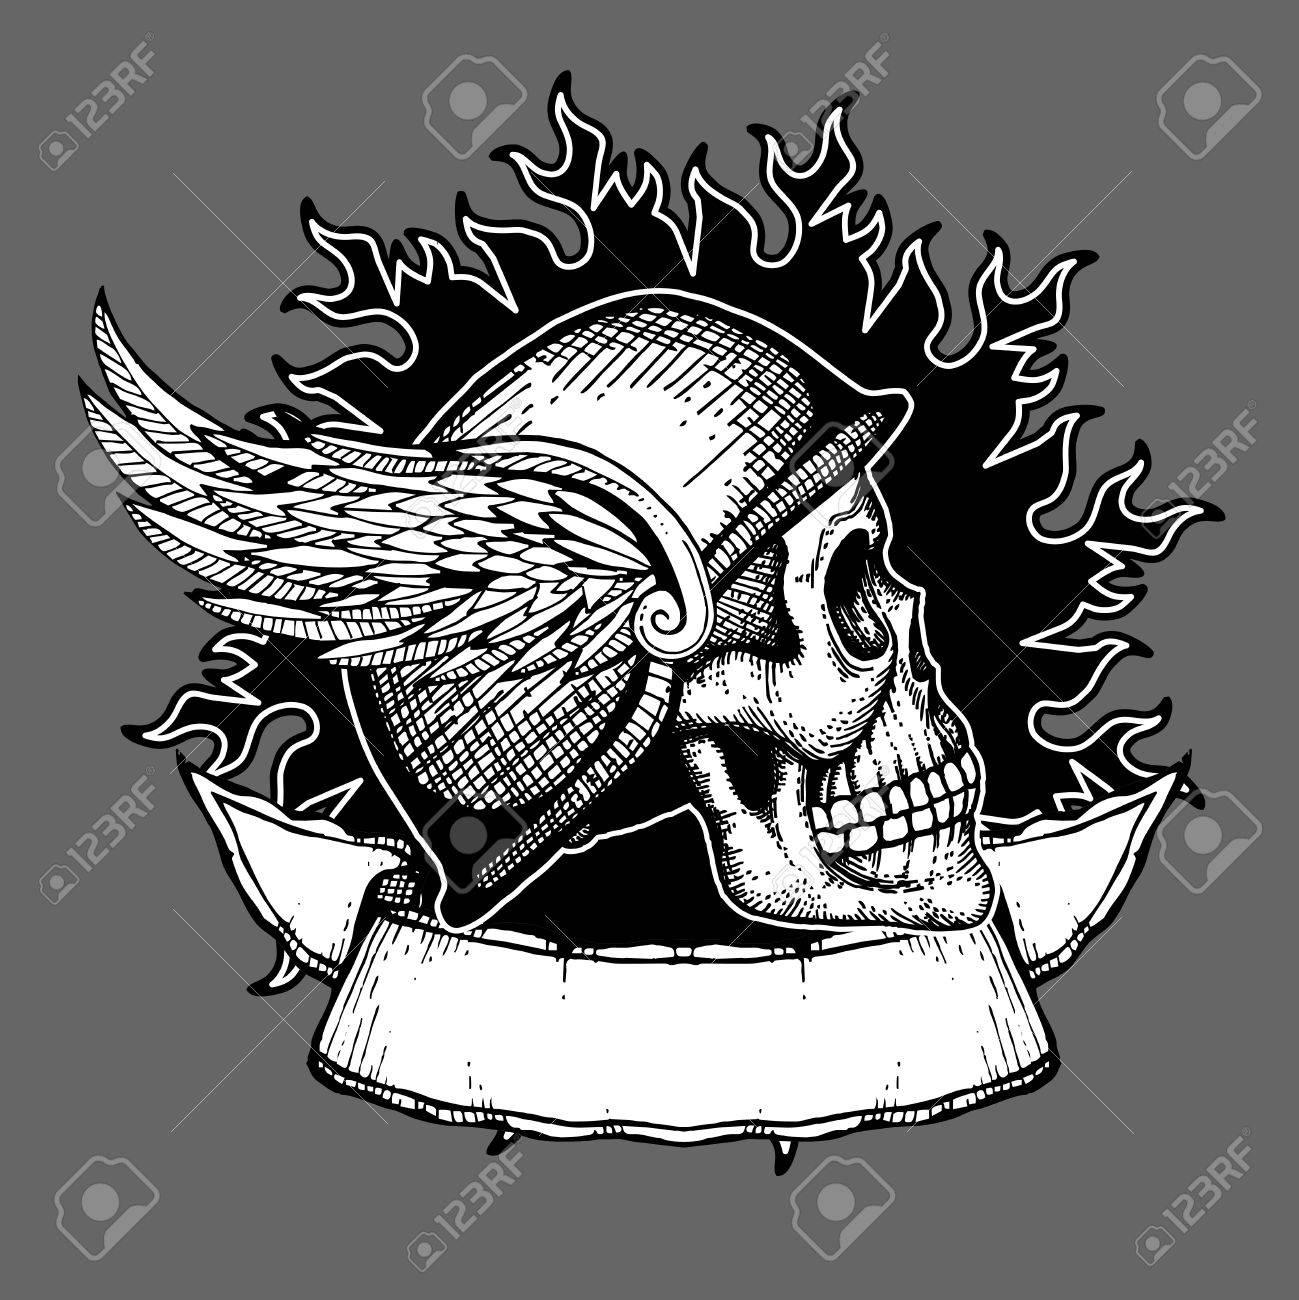 Motorcycle with biker tattoo - Retro Motorcycle Vector T Shirt Design Biker Skull Emblem Biker Tattoo Helmet With Wings Illustration